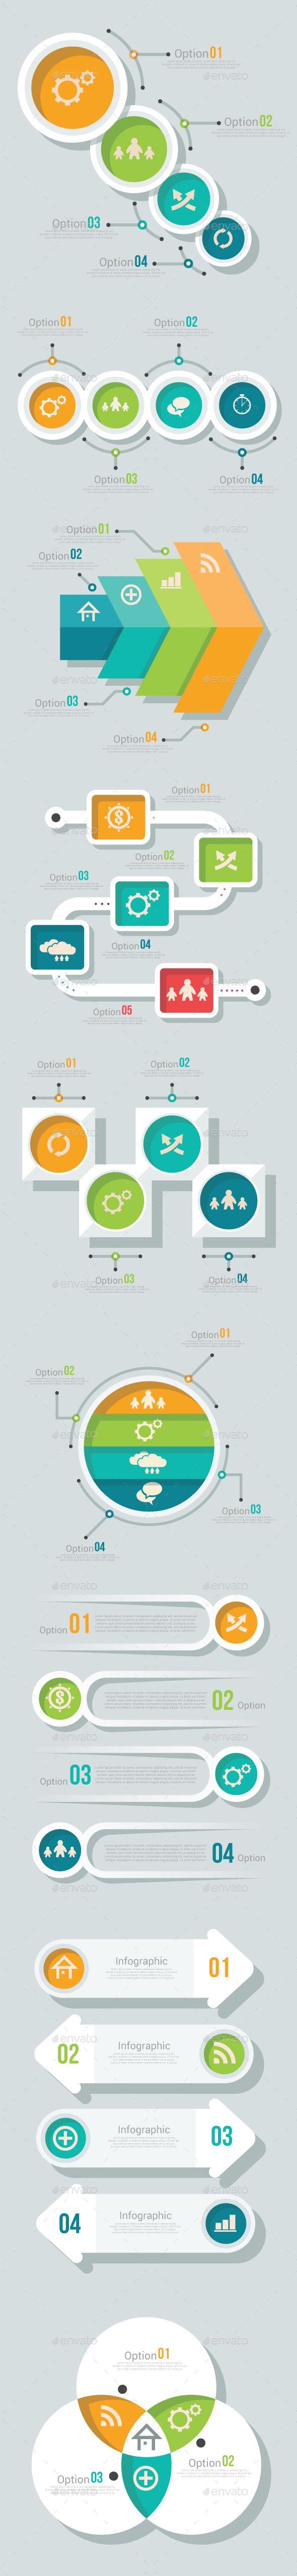 Infographic design brisbane